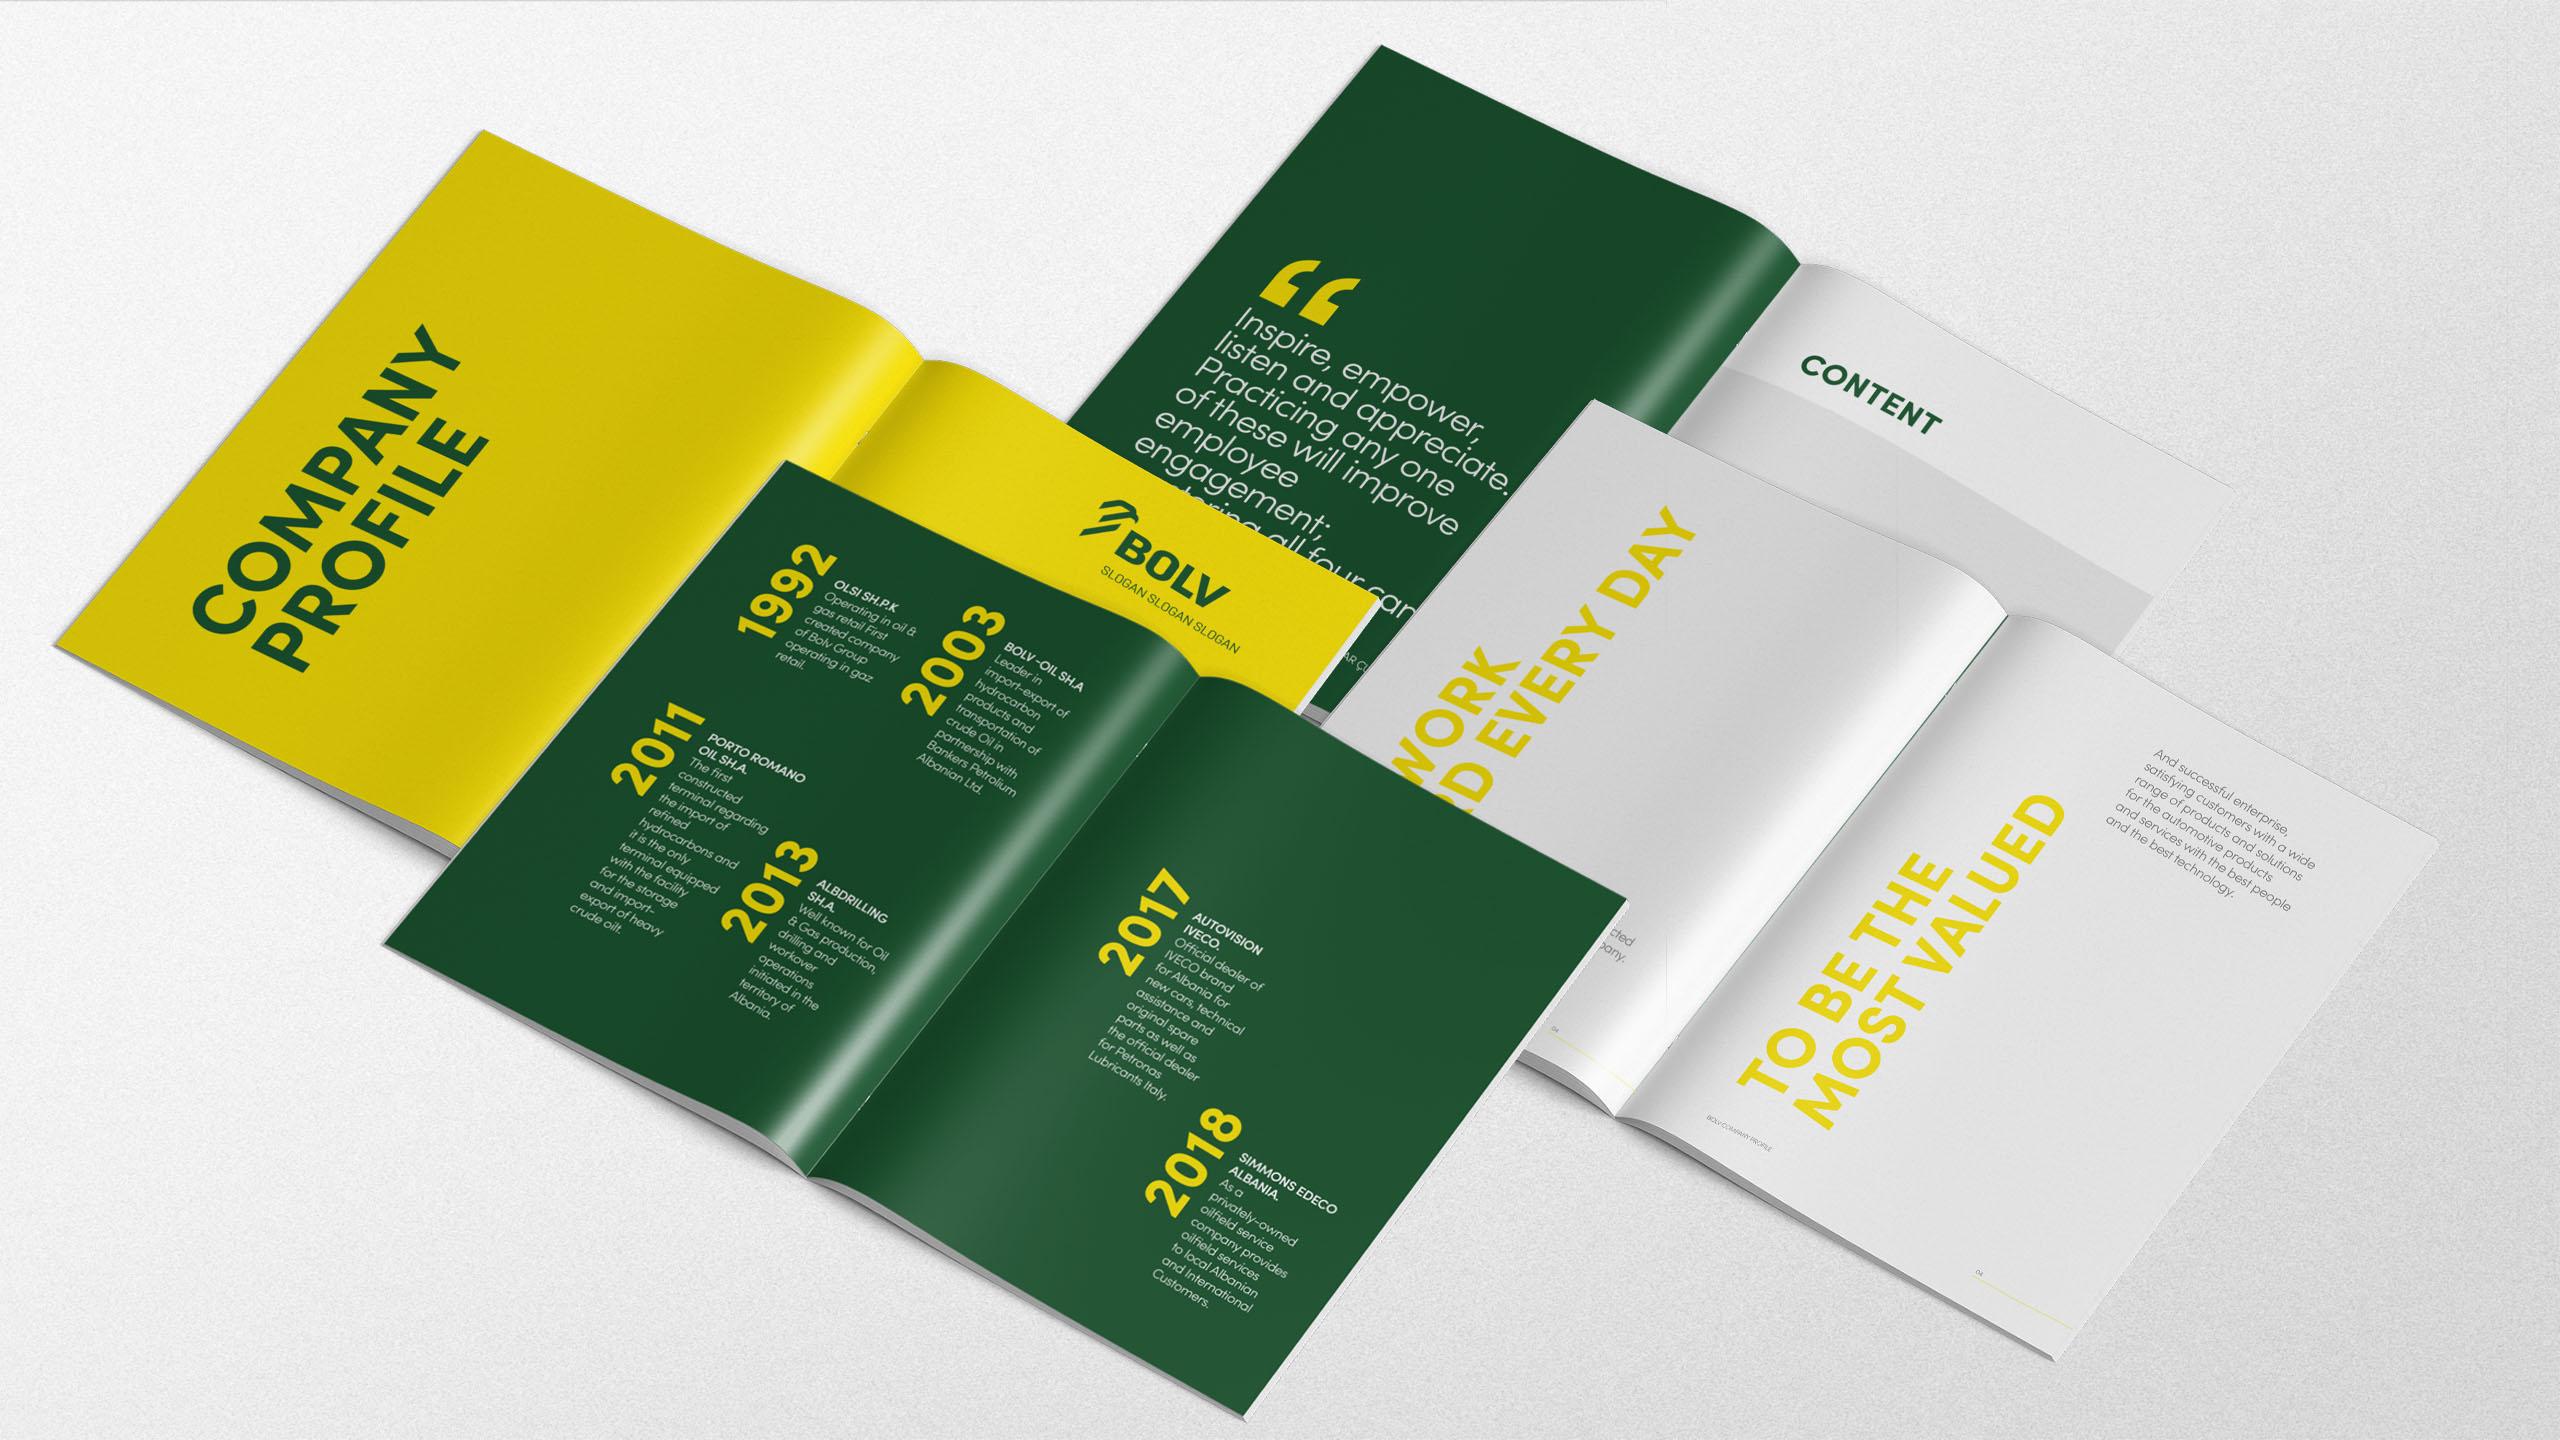 Bolv Group Project Img 13 - Vatra Agency / Founder & CEO Gerton Bejo